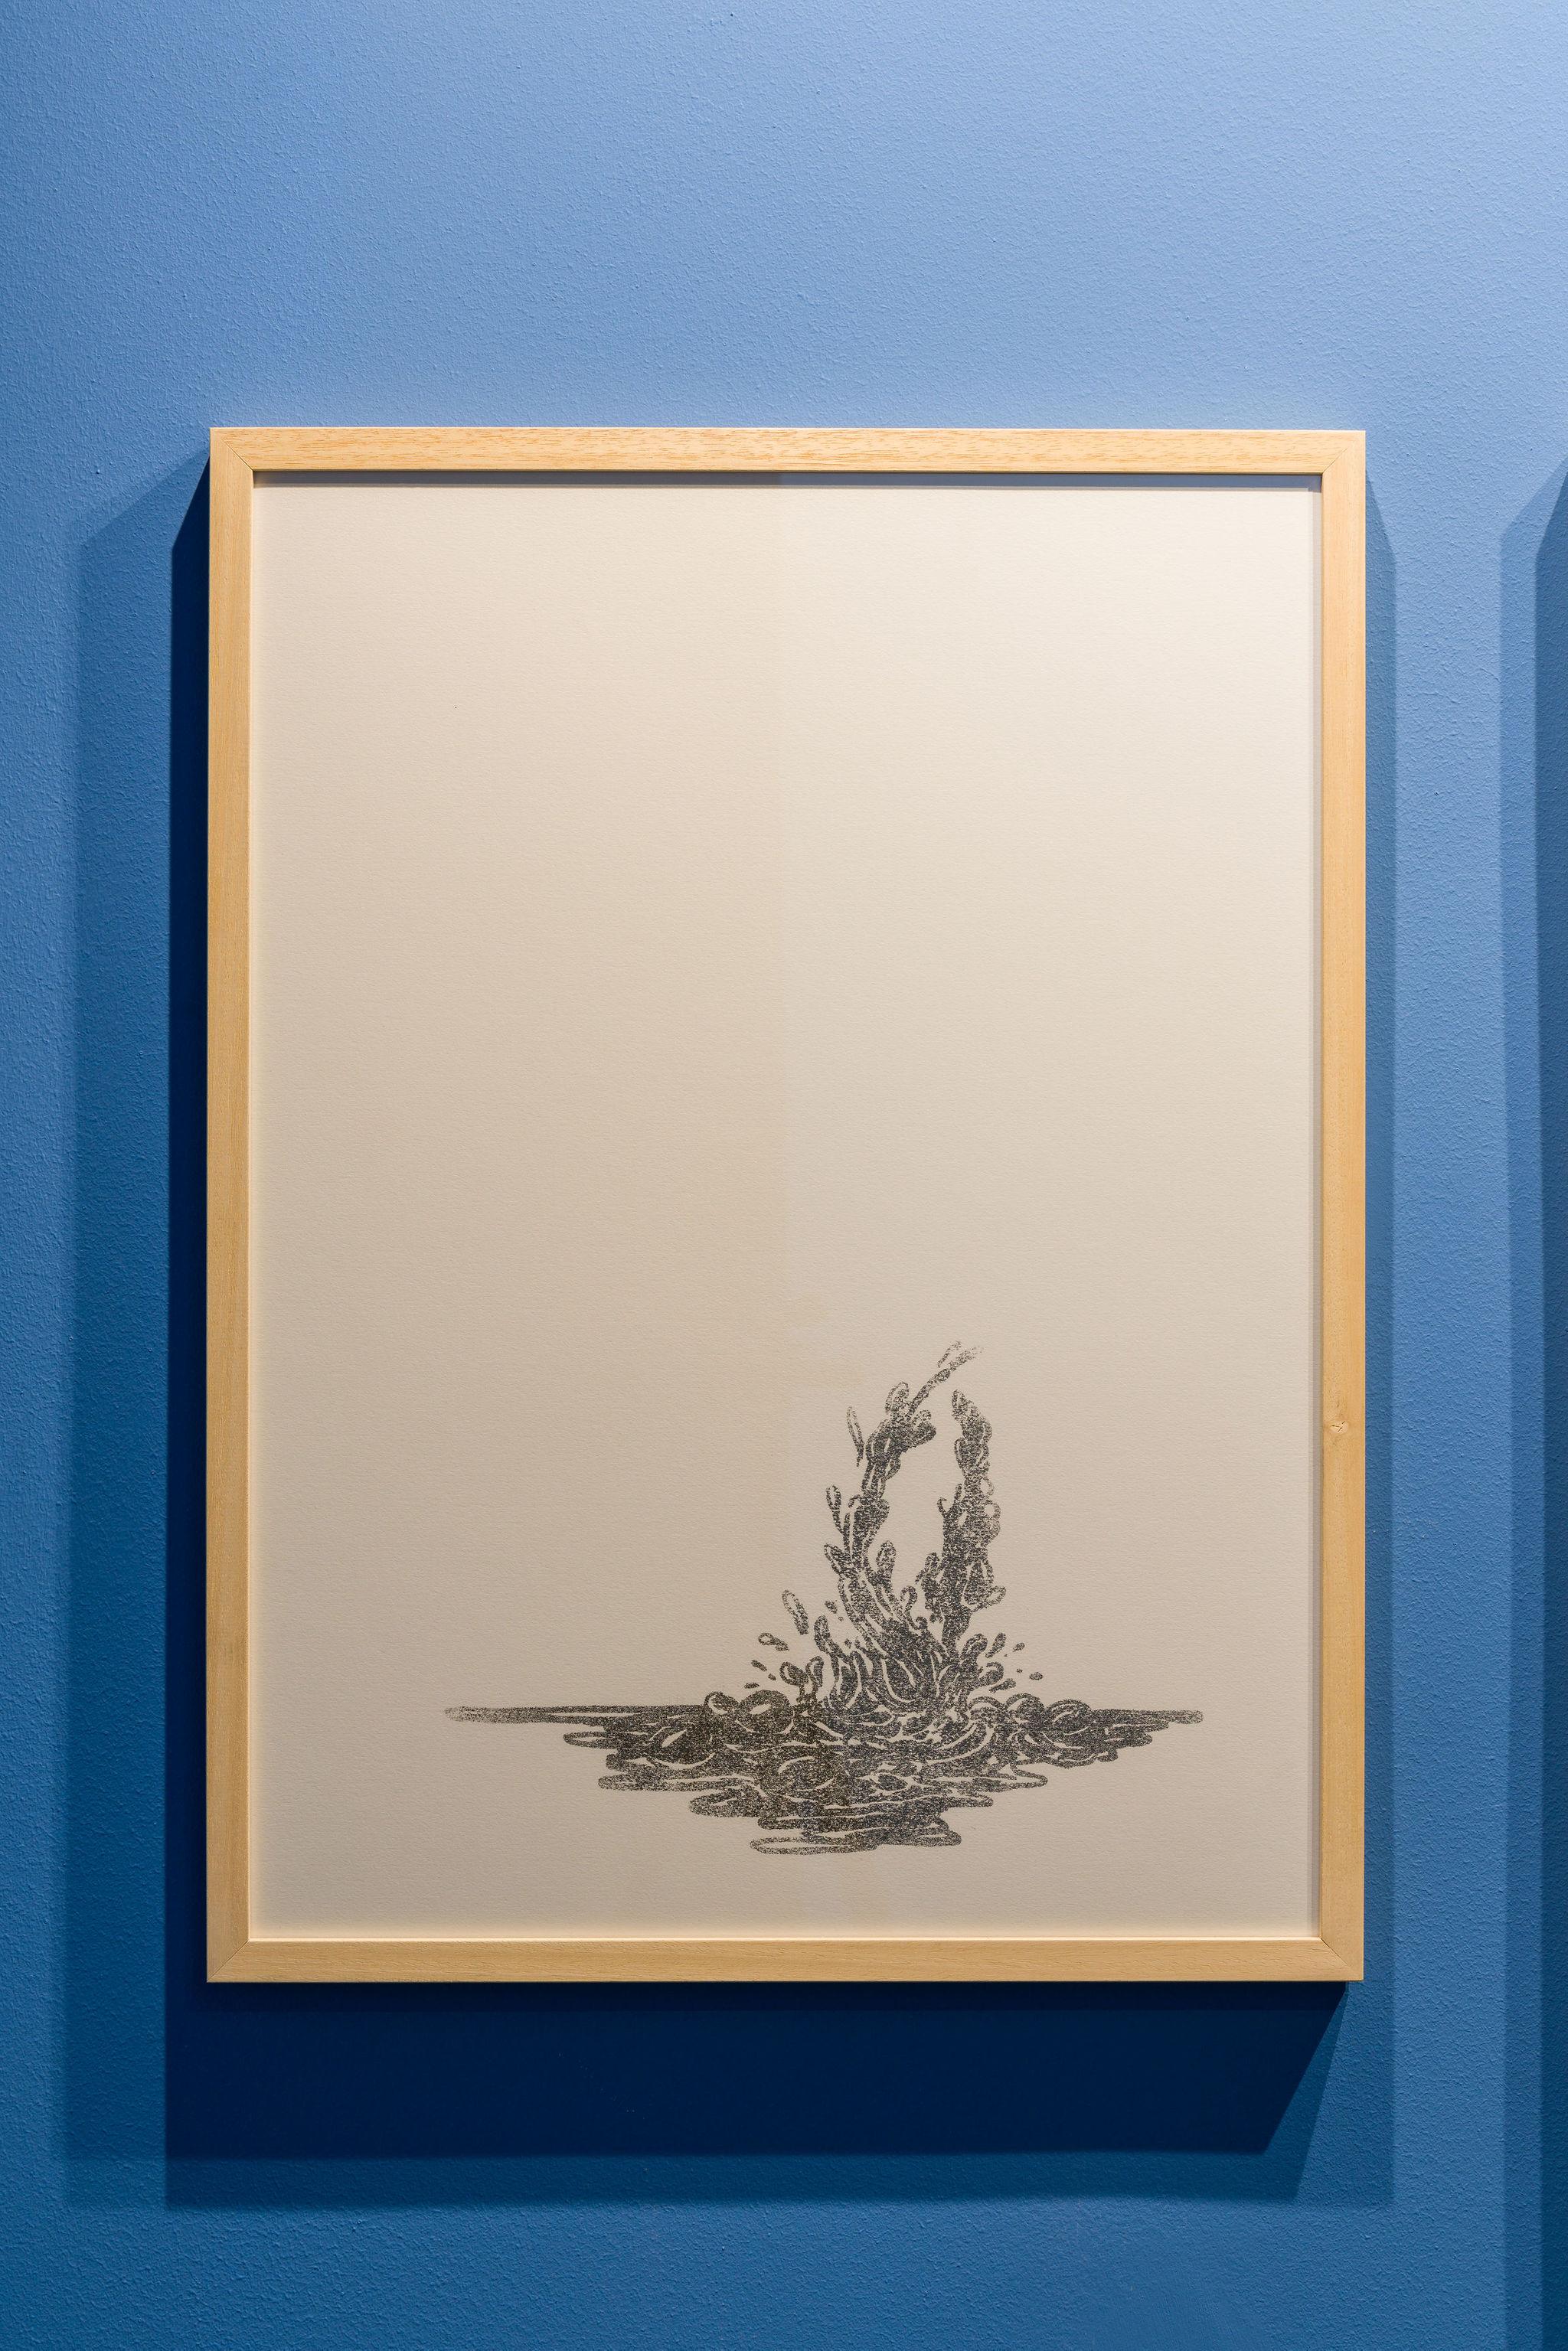 Flaviu Rogojan, Small Assymetriad, 2021, Dye Transfer on Paper